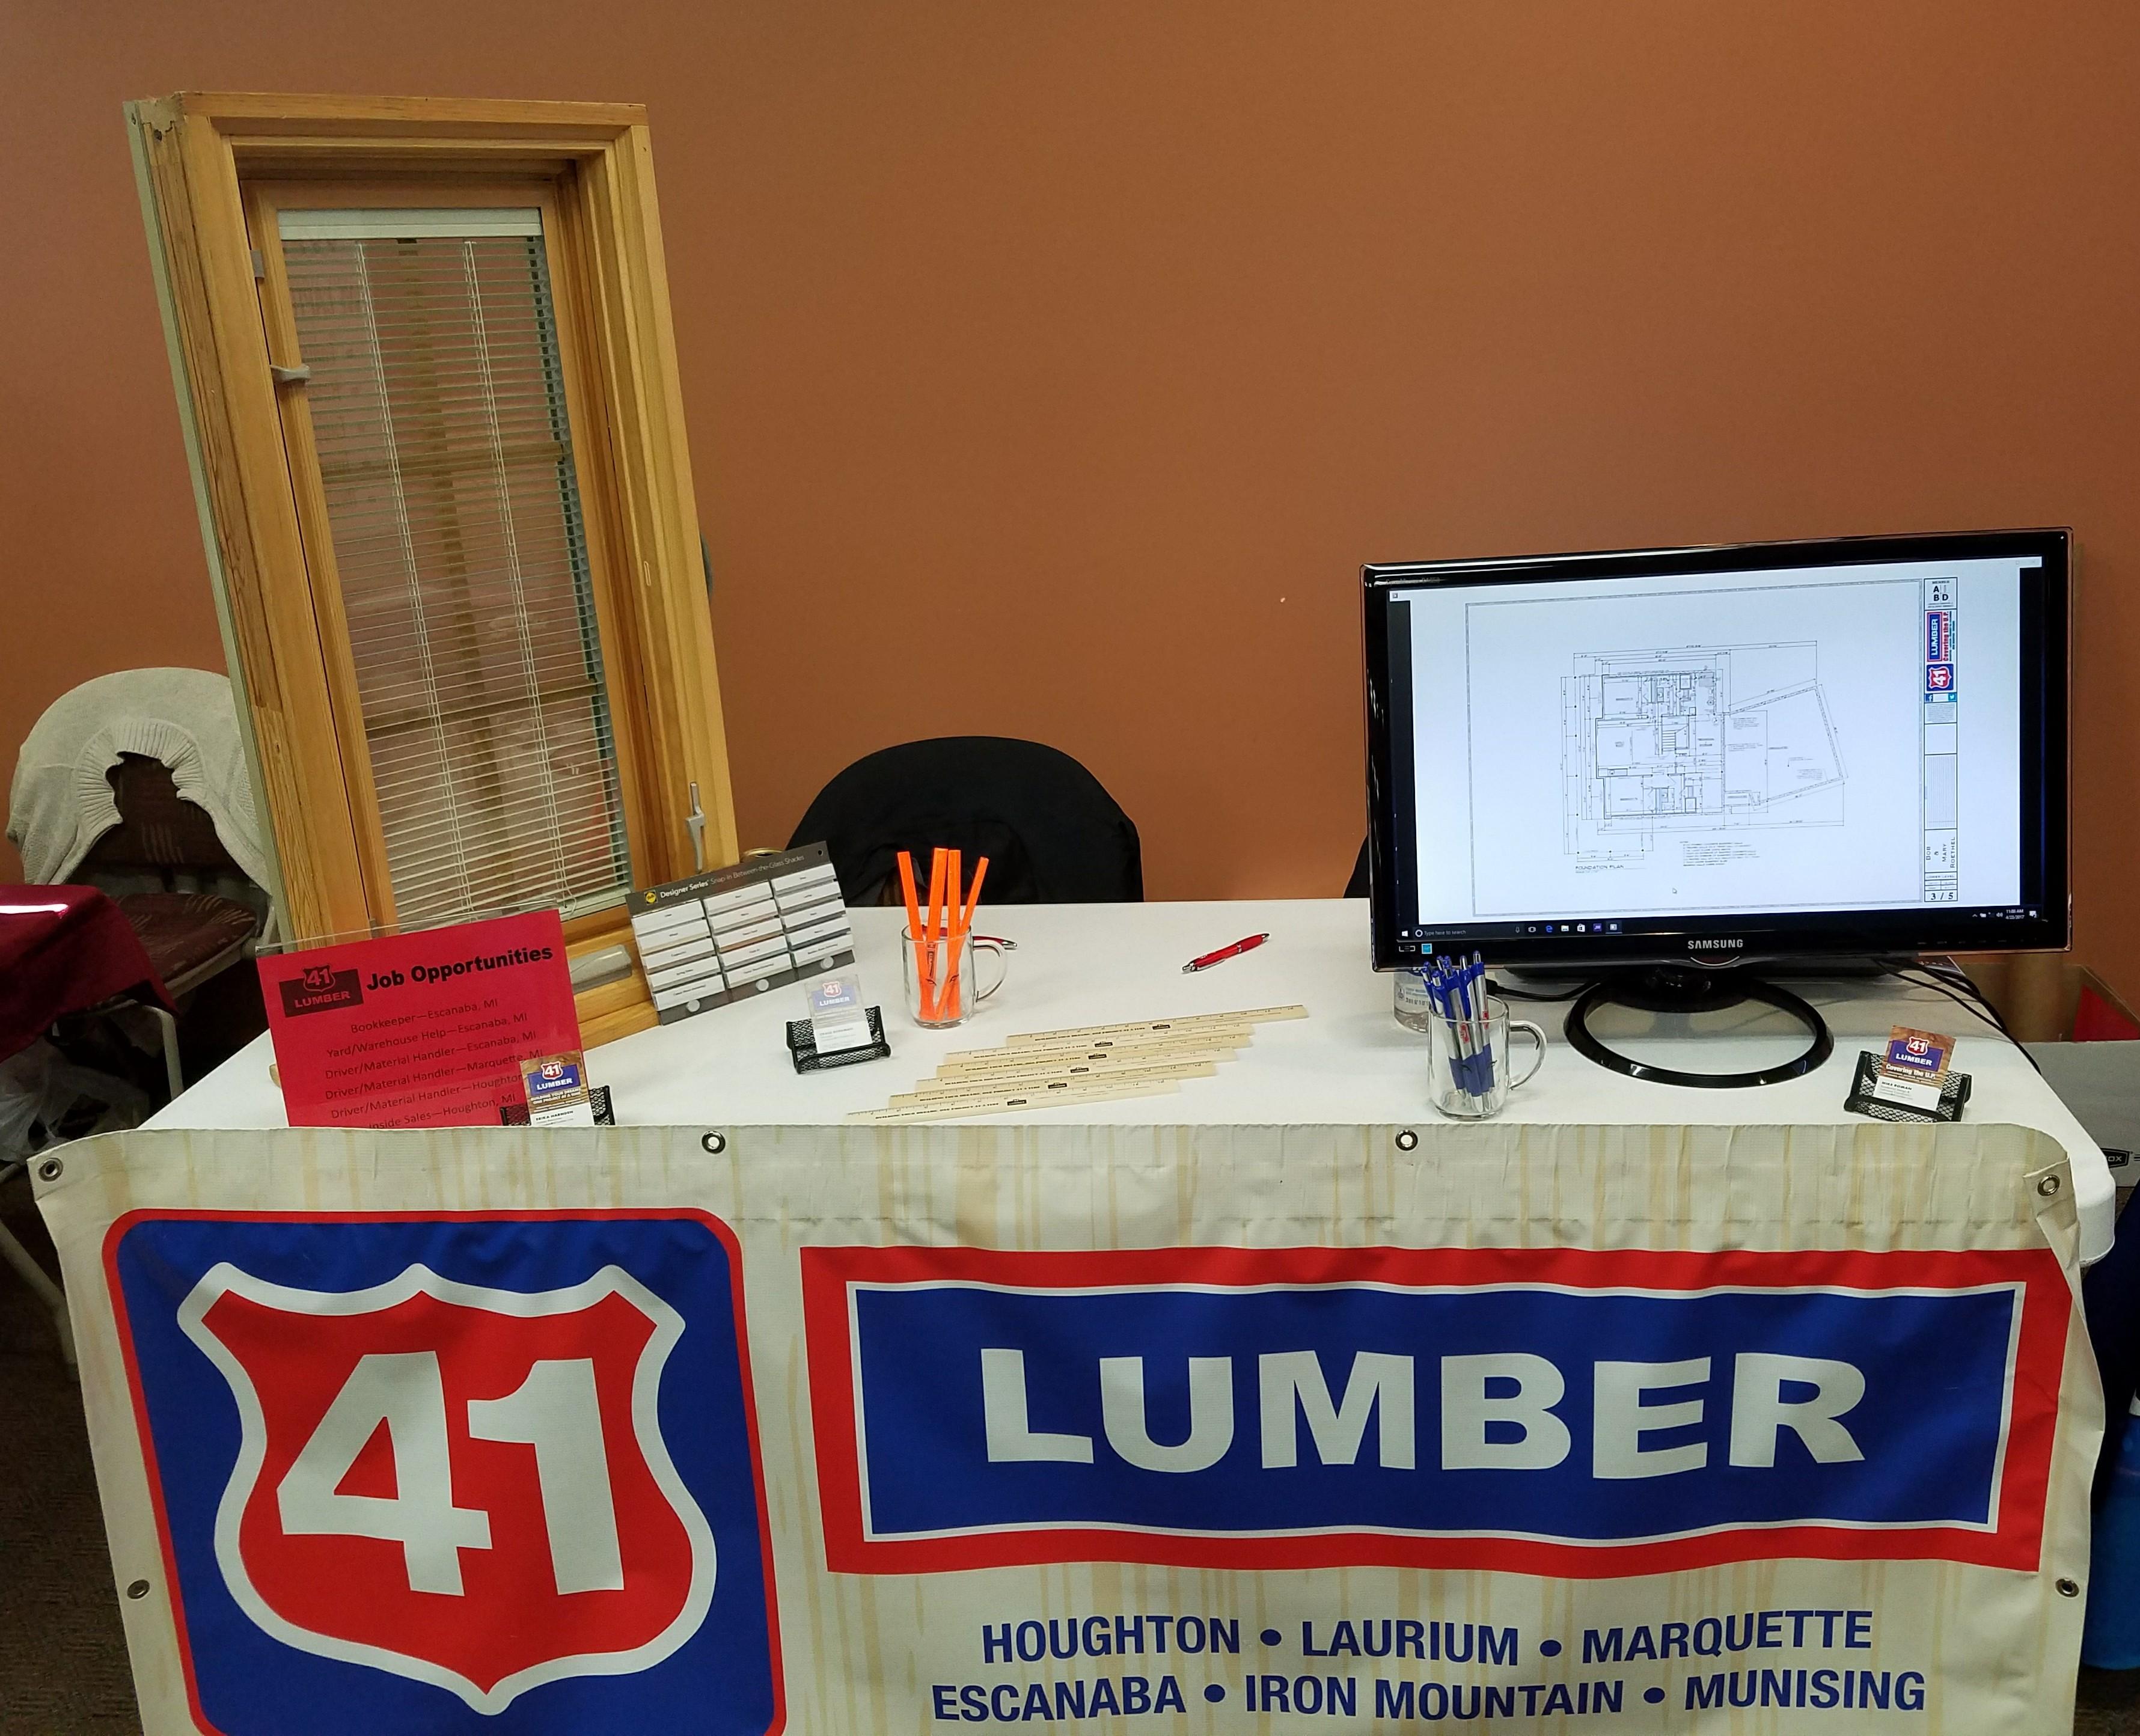 41 Lumber Expo